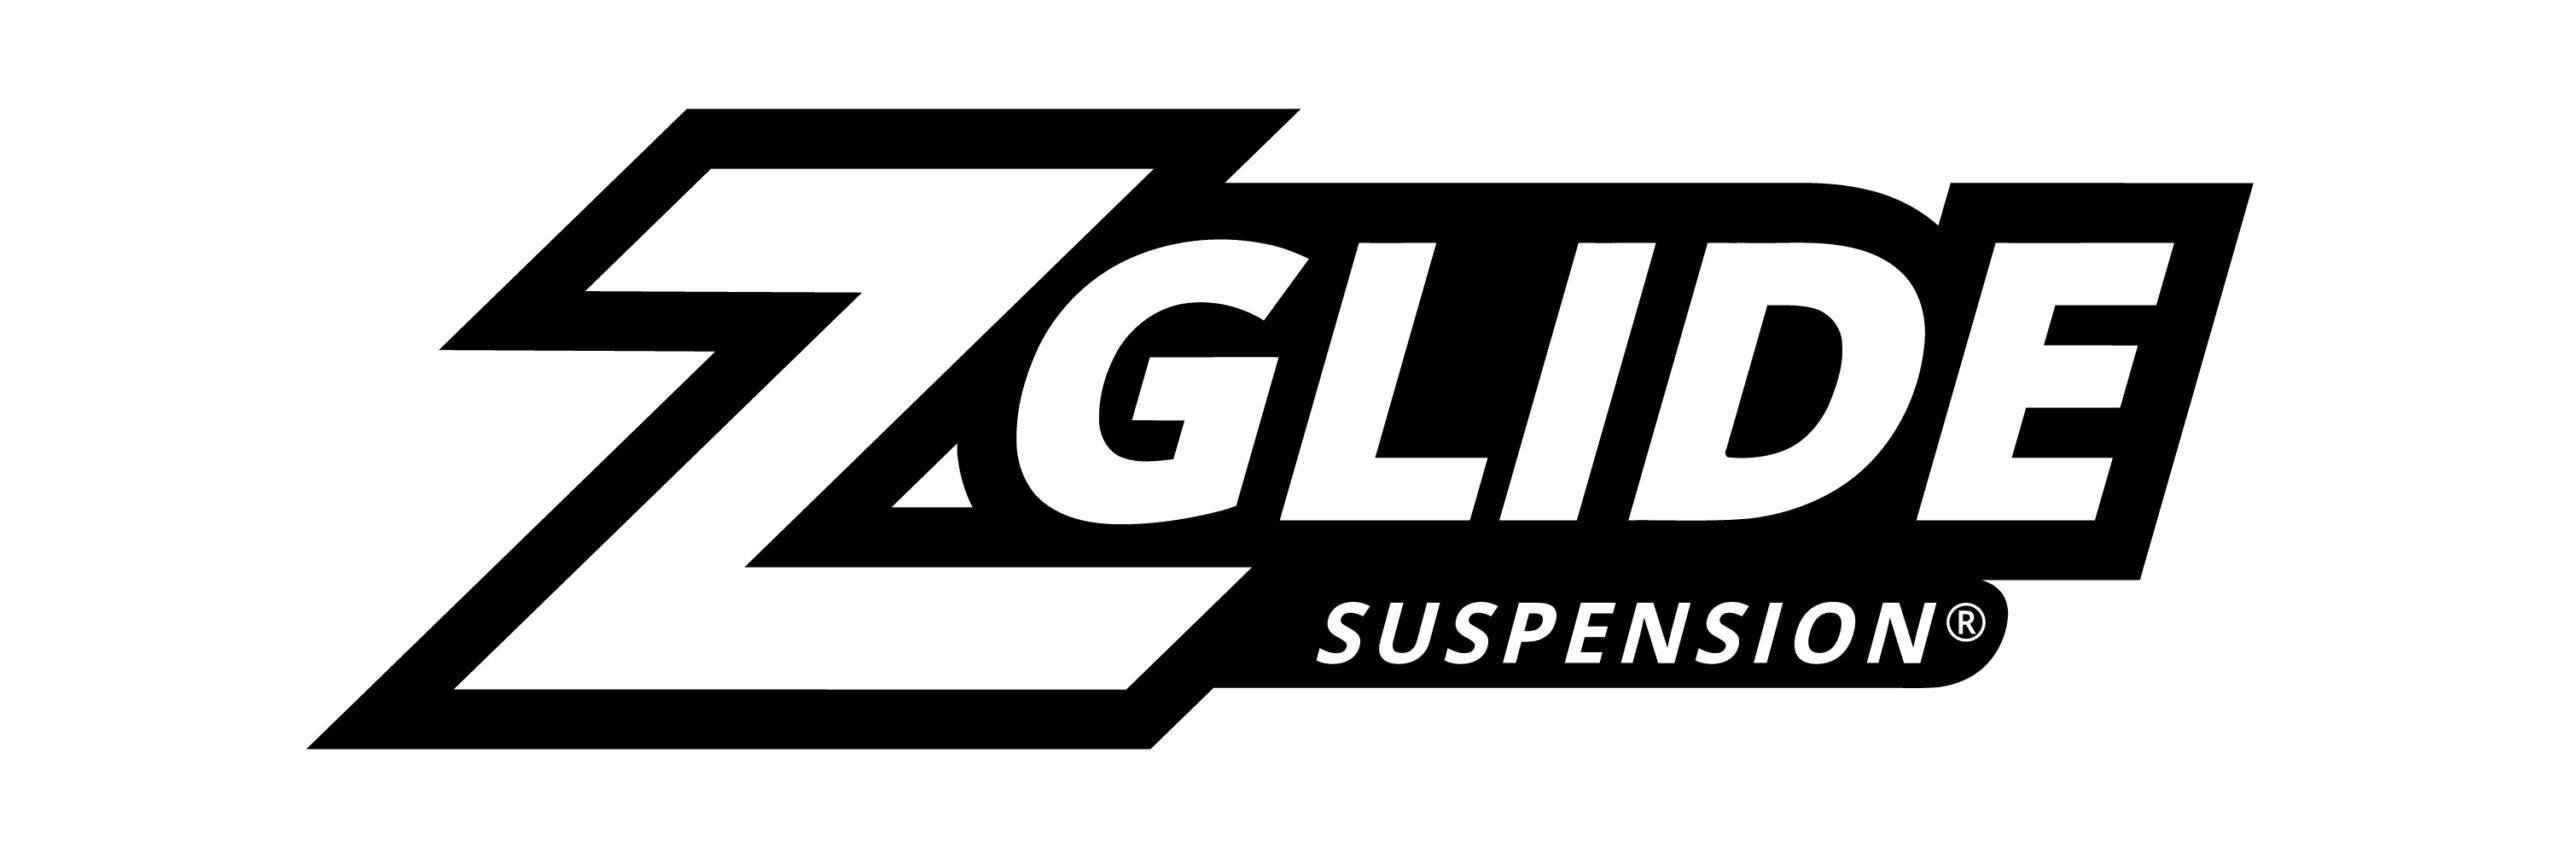 ZGlide logo (1)